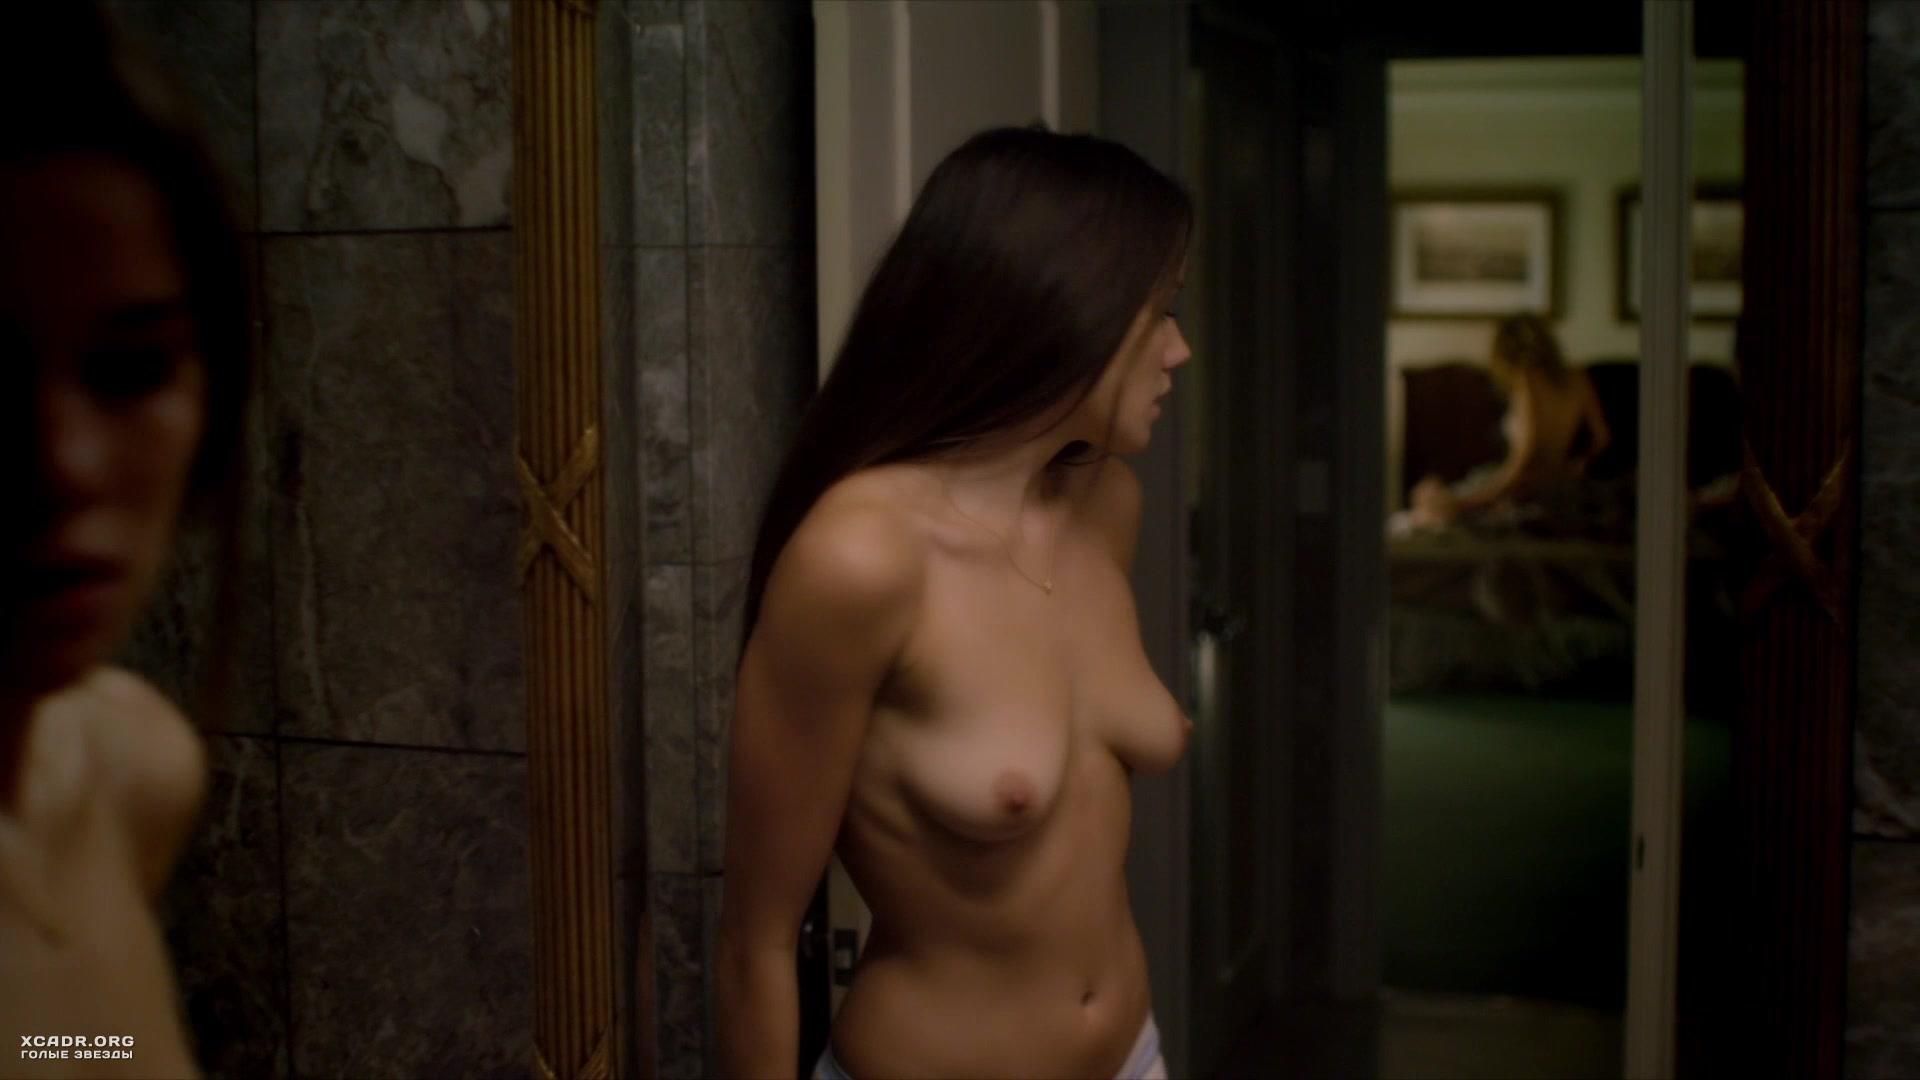 eroticheskie-i-pornograficheskie-video